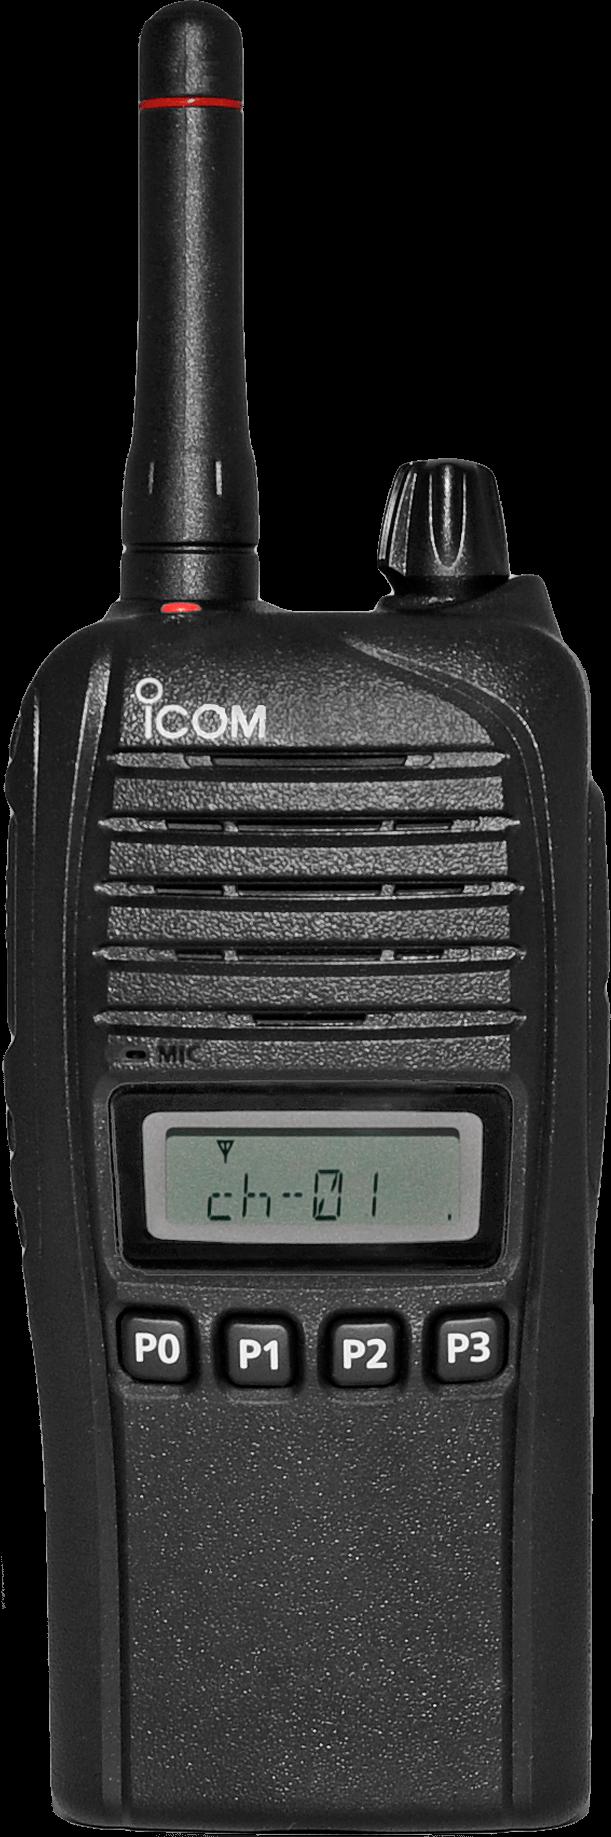 Icom IC-F4032S featured image